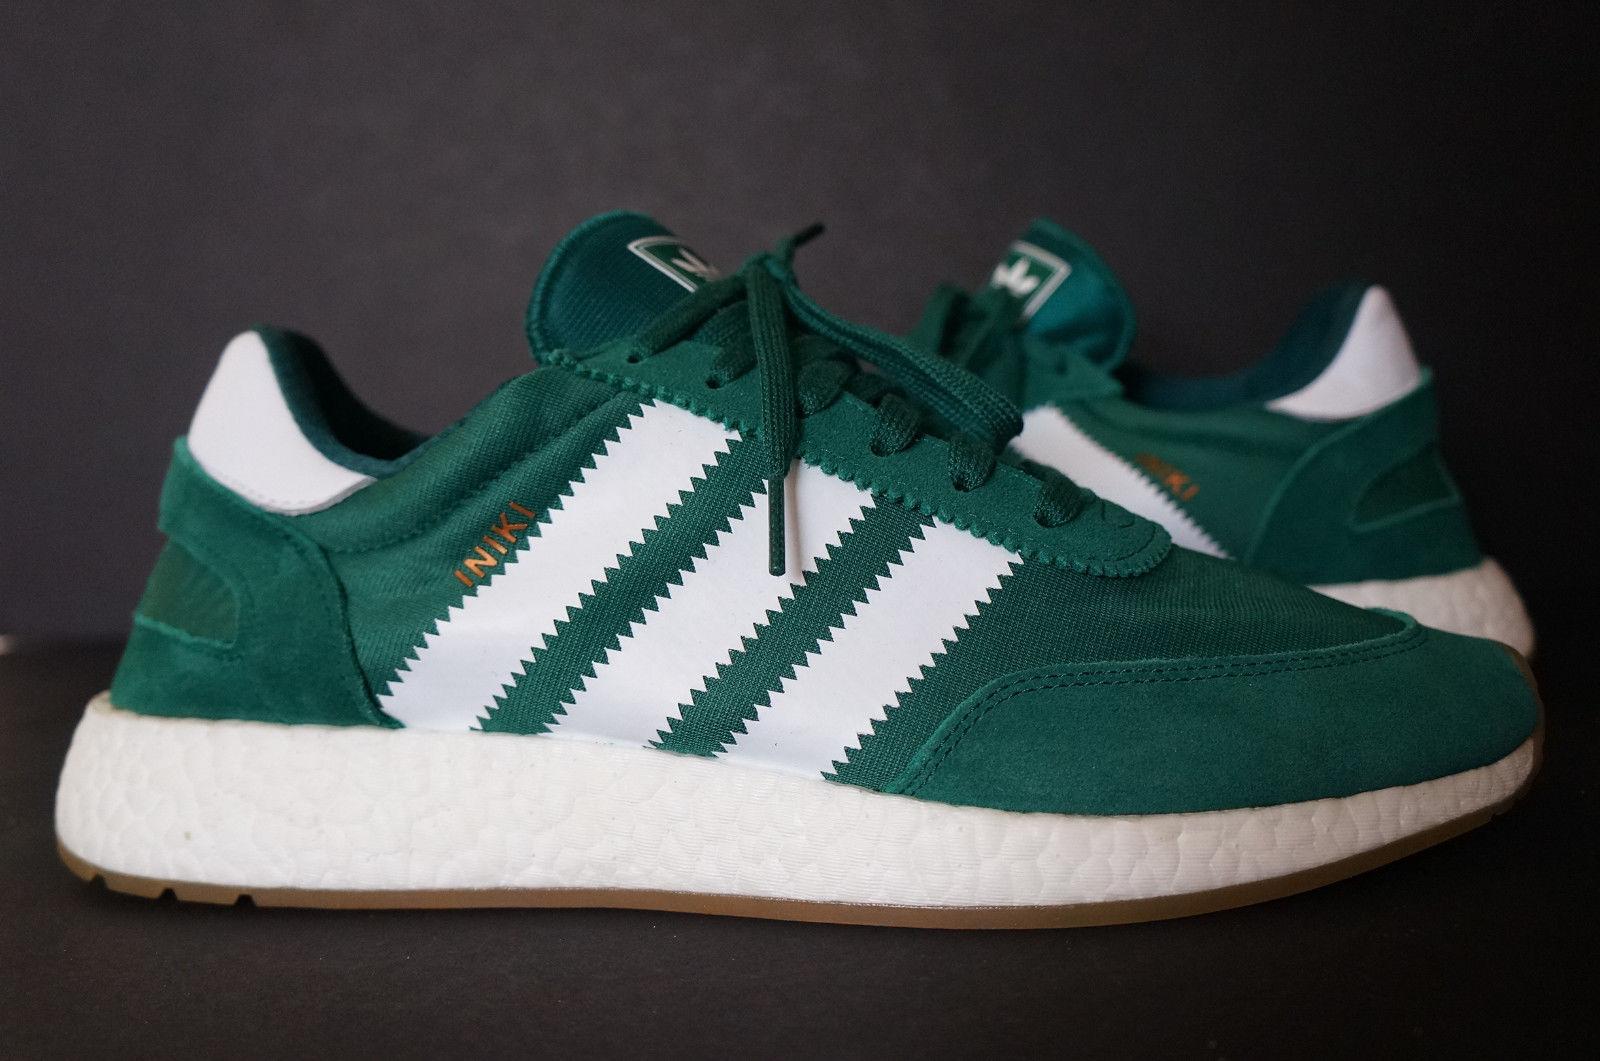 Adidas Pure Boost Clima วิ่งก็ได้ แค่เดิน